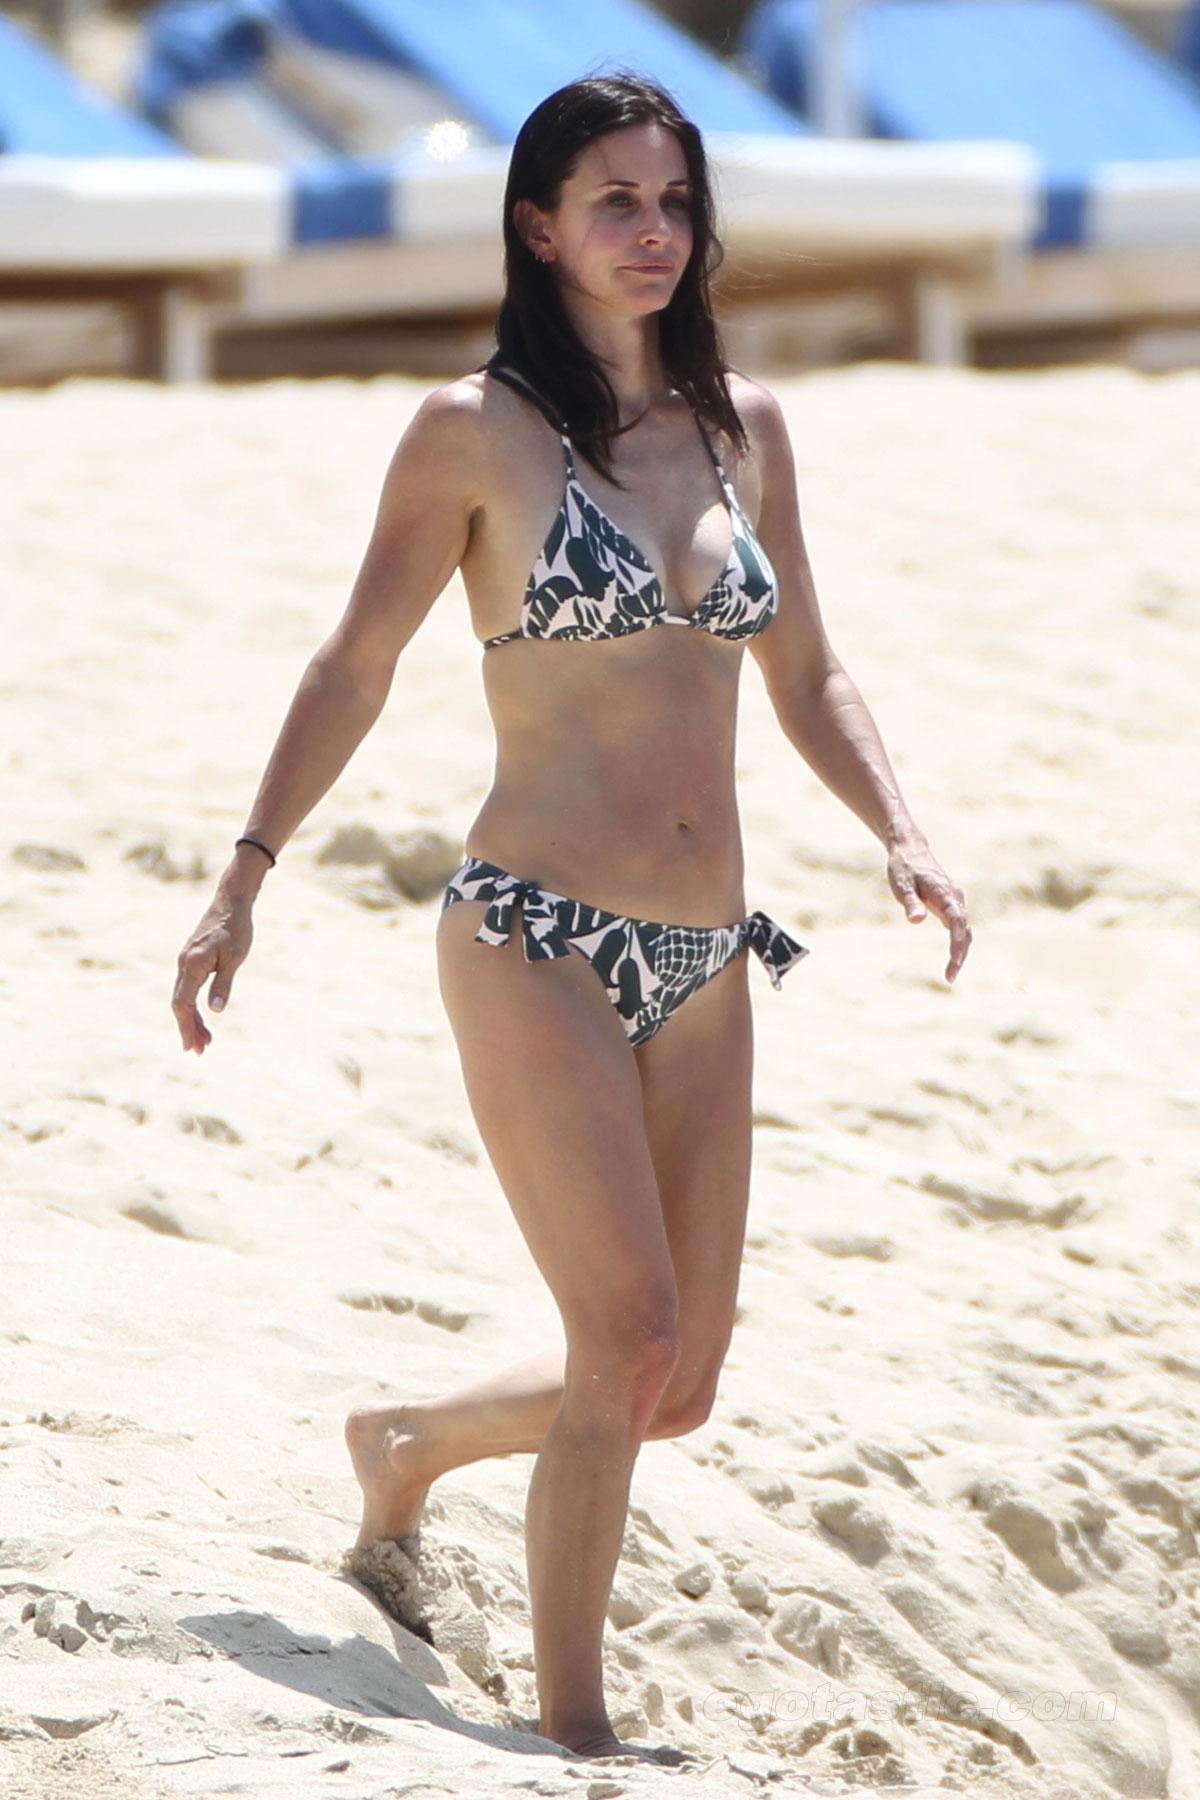 http://therealmanslist.files.wordpress.com/2011/03/courteney-cox-st-barts-bikini-01.jpg